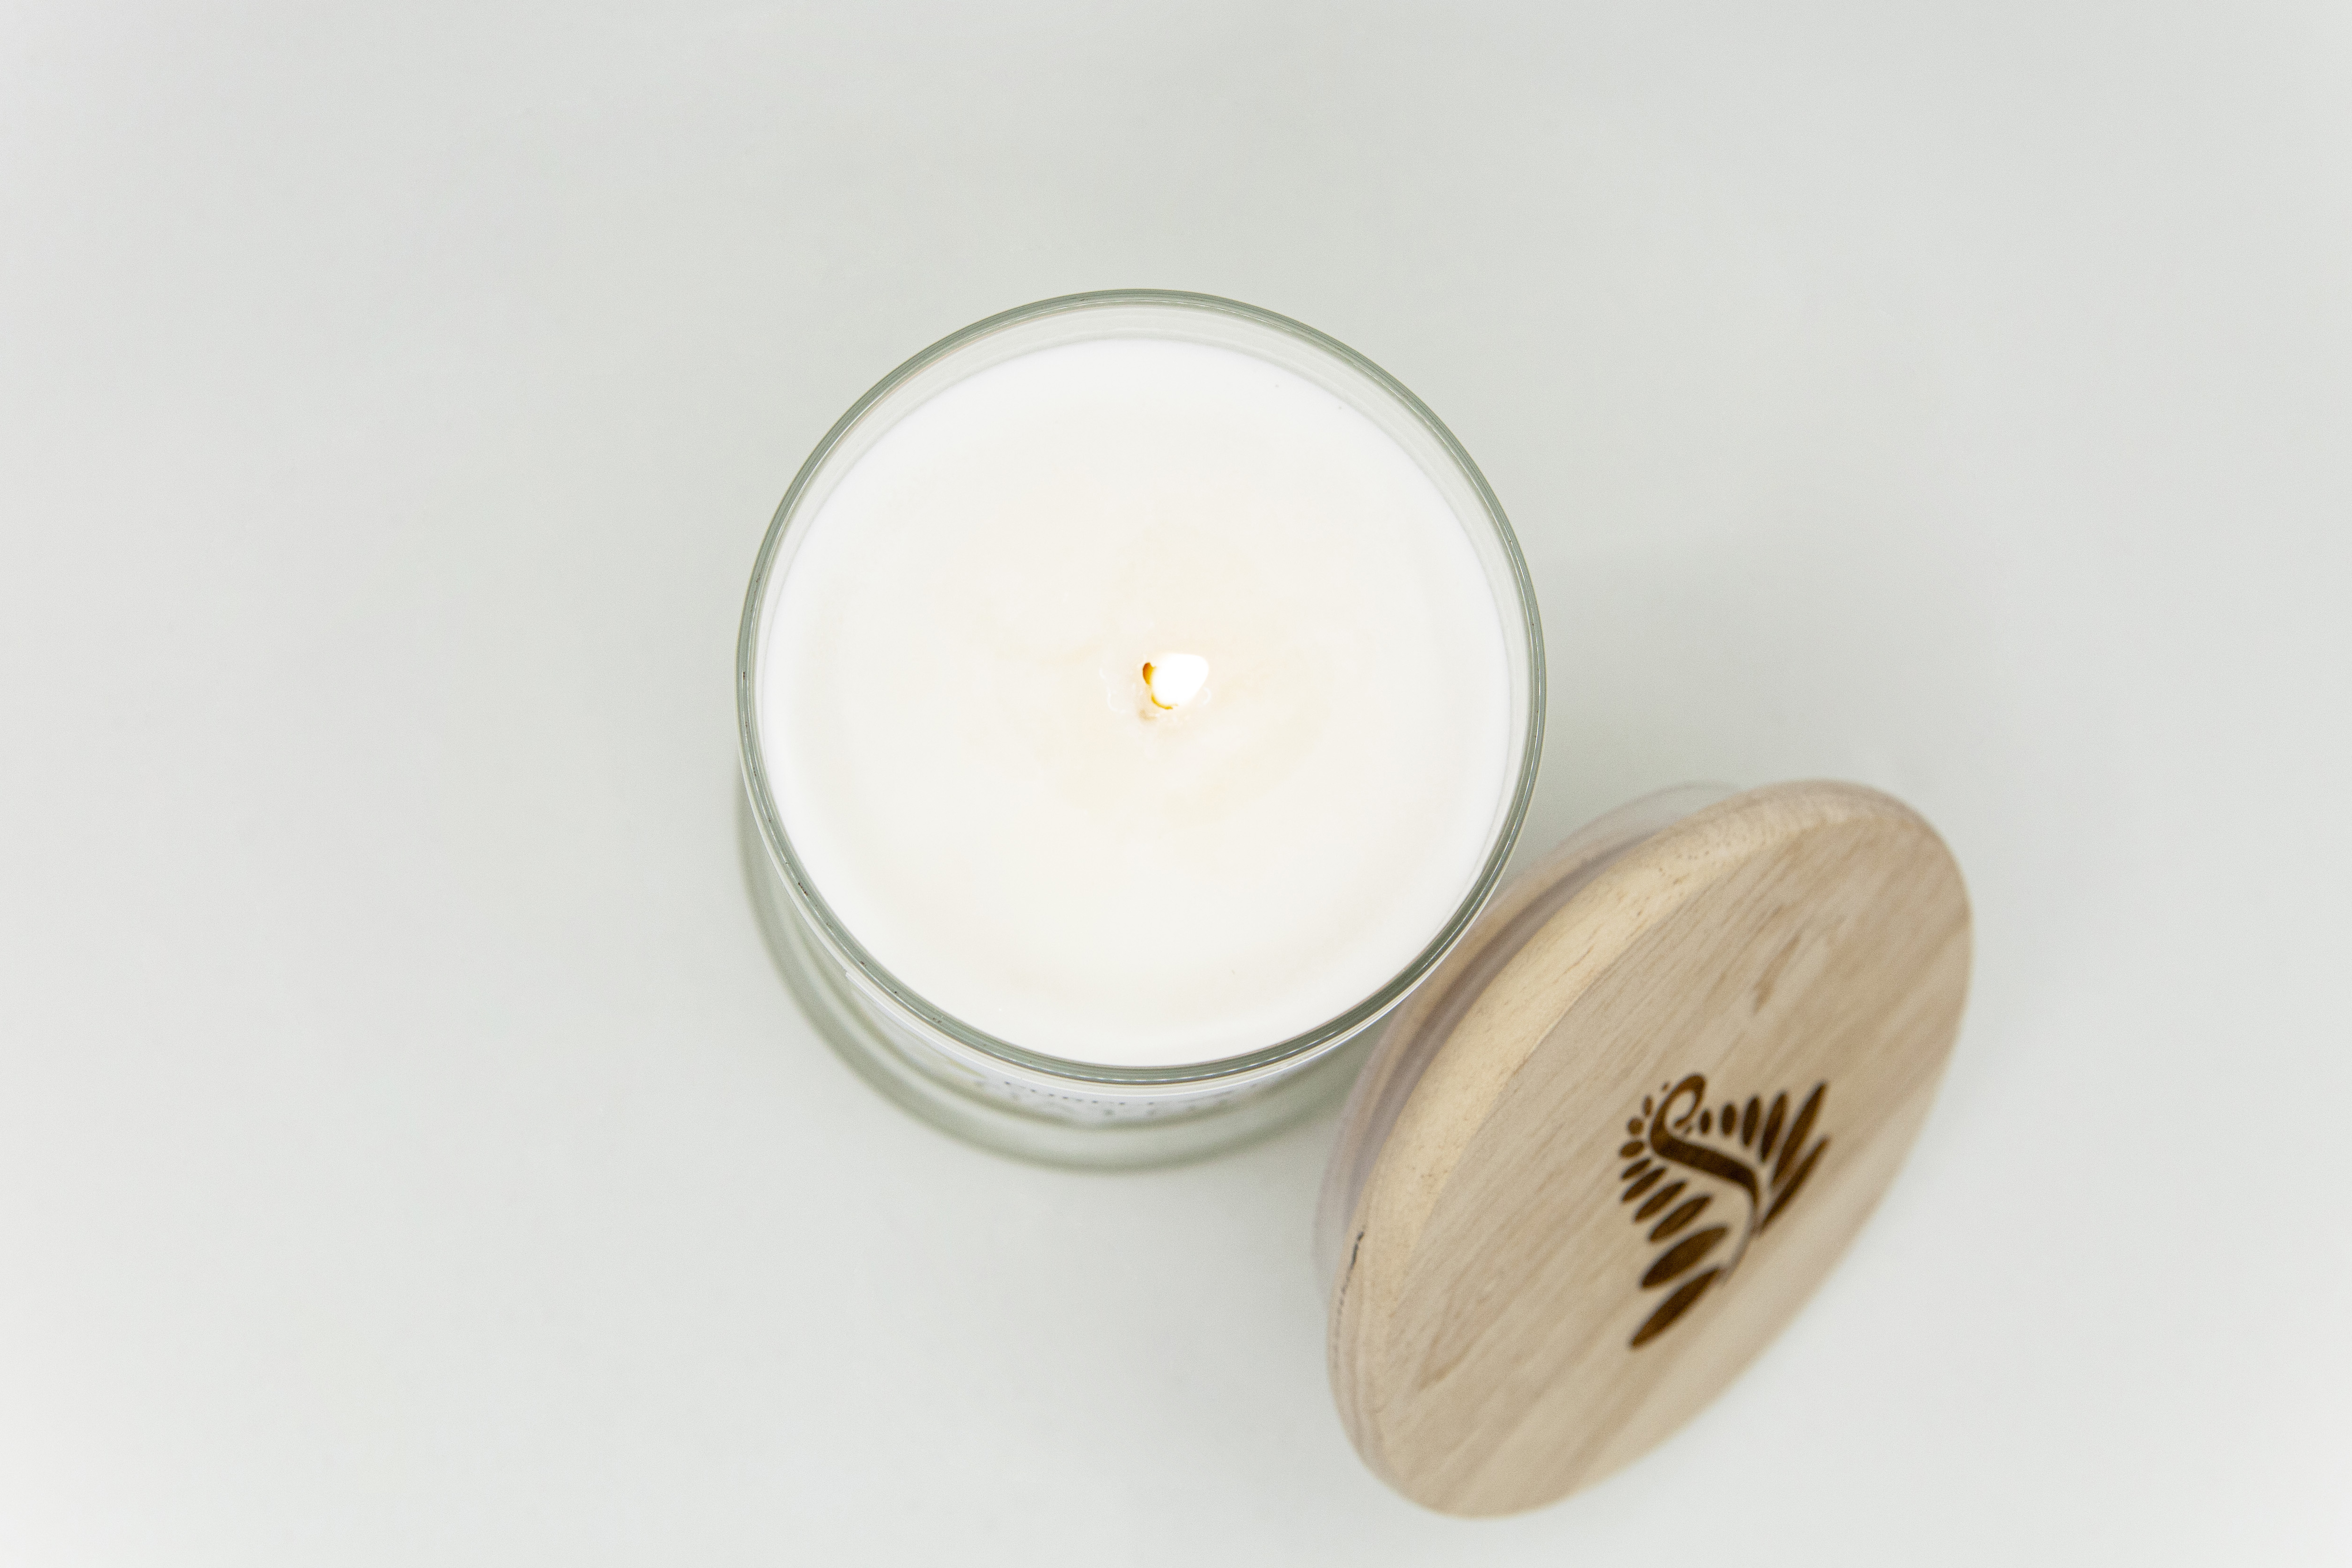 oatmeal honey soy wax glass jar handcrafted wood lid